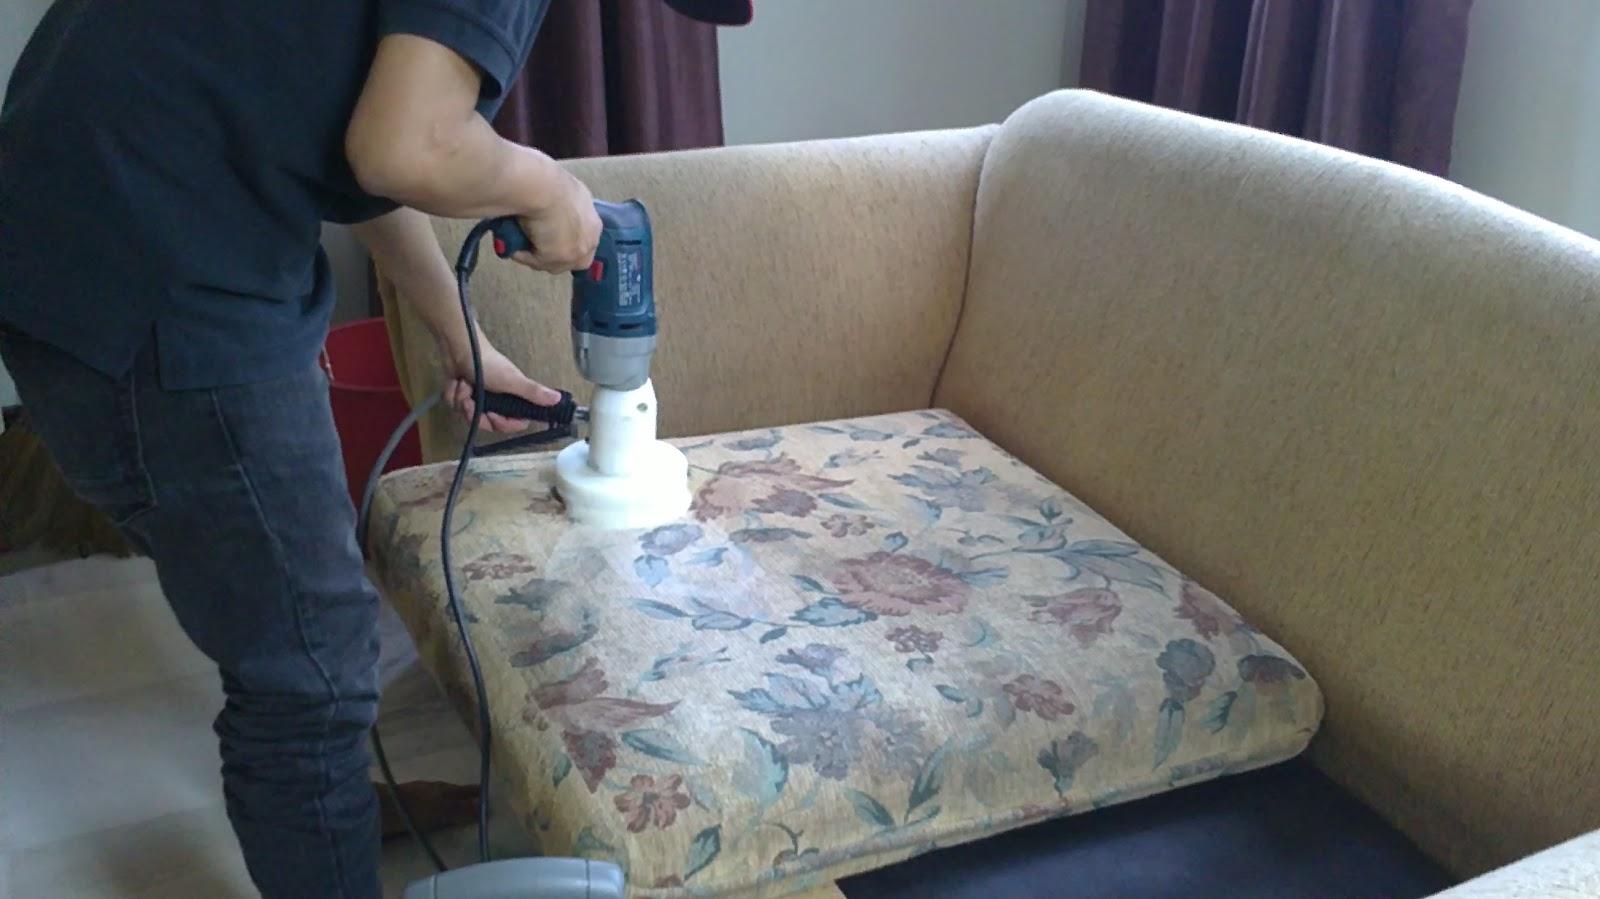 Чем чистить обивку дивана в домашних условиях